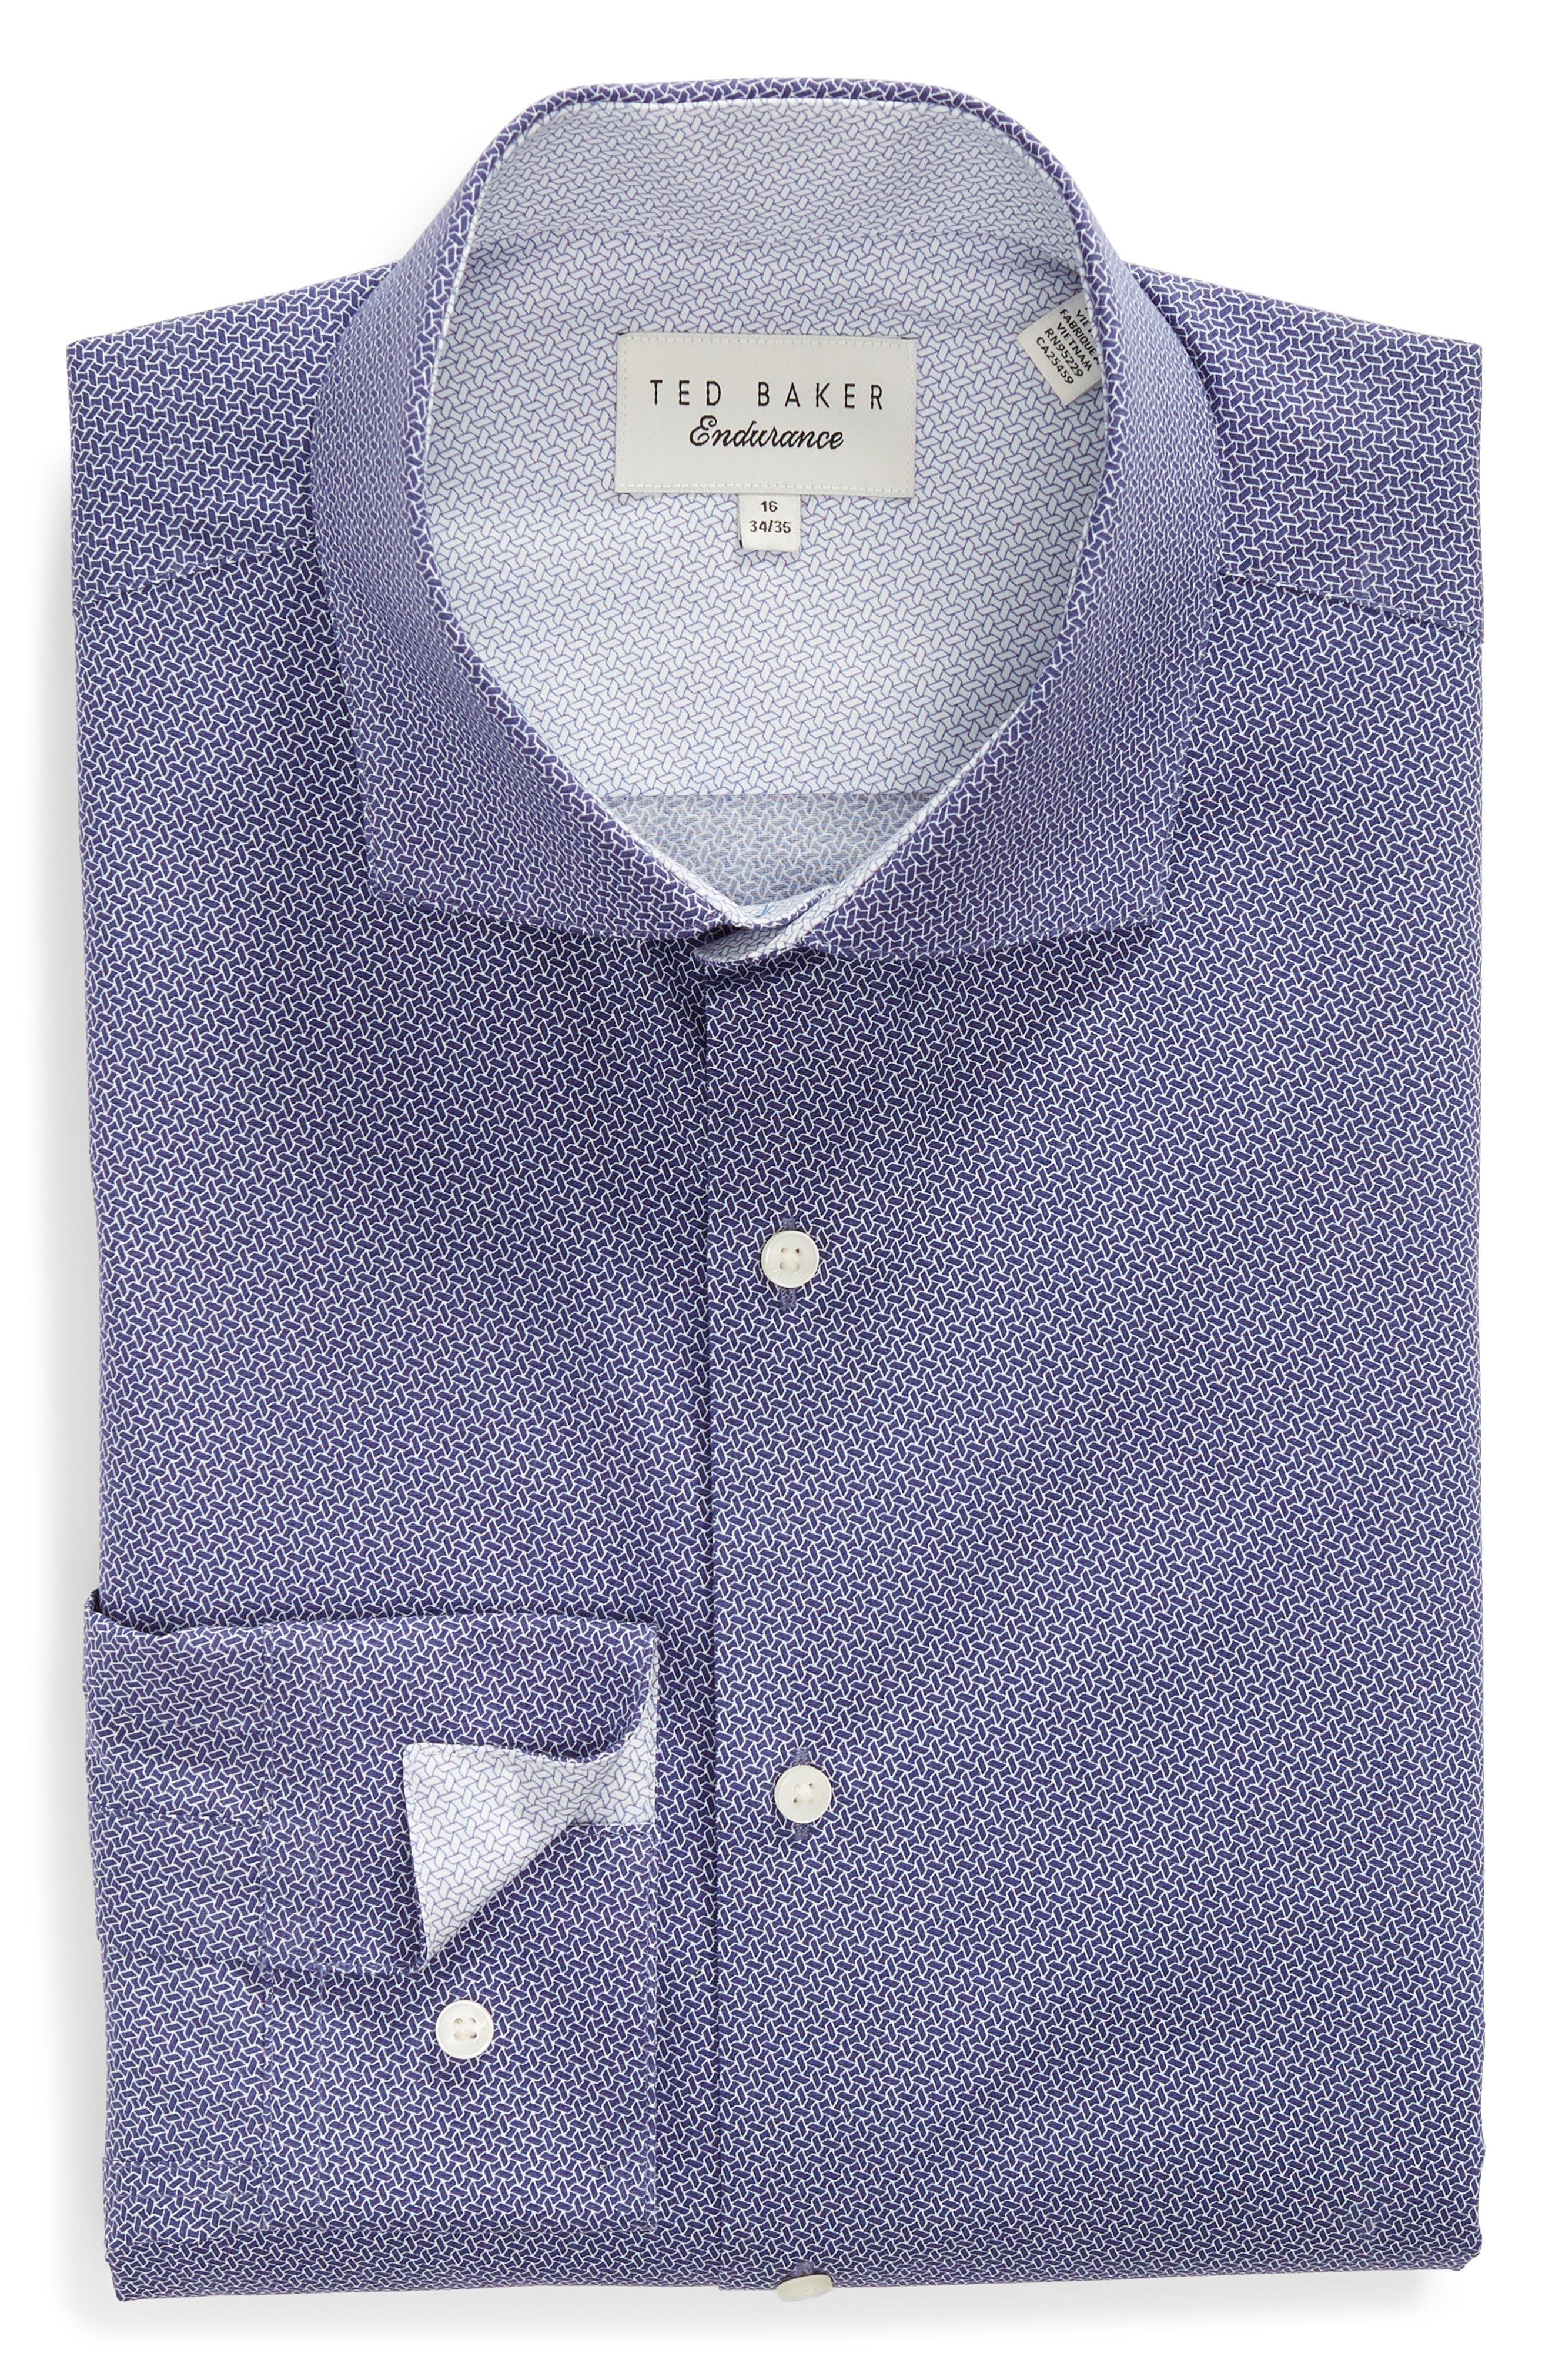 Strame Slim Fit Geometric Dress Shirt,                             Alternate thumbnail 5, color,                             510